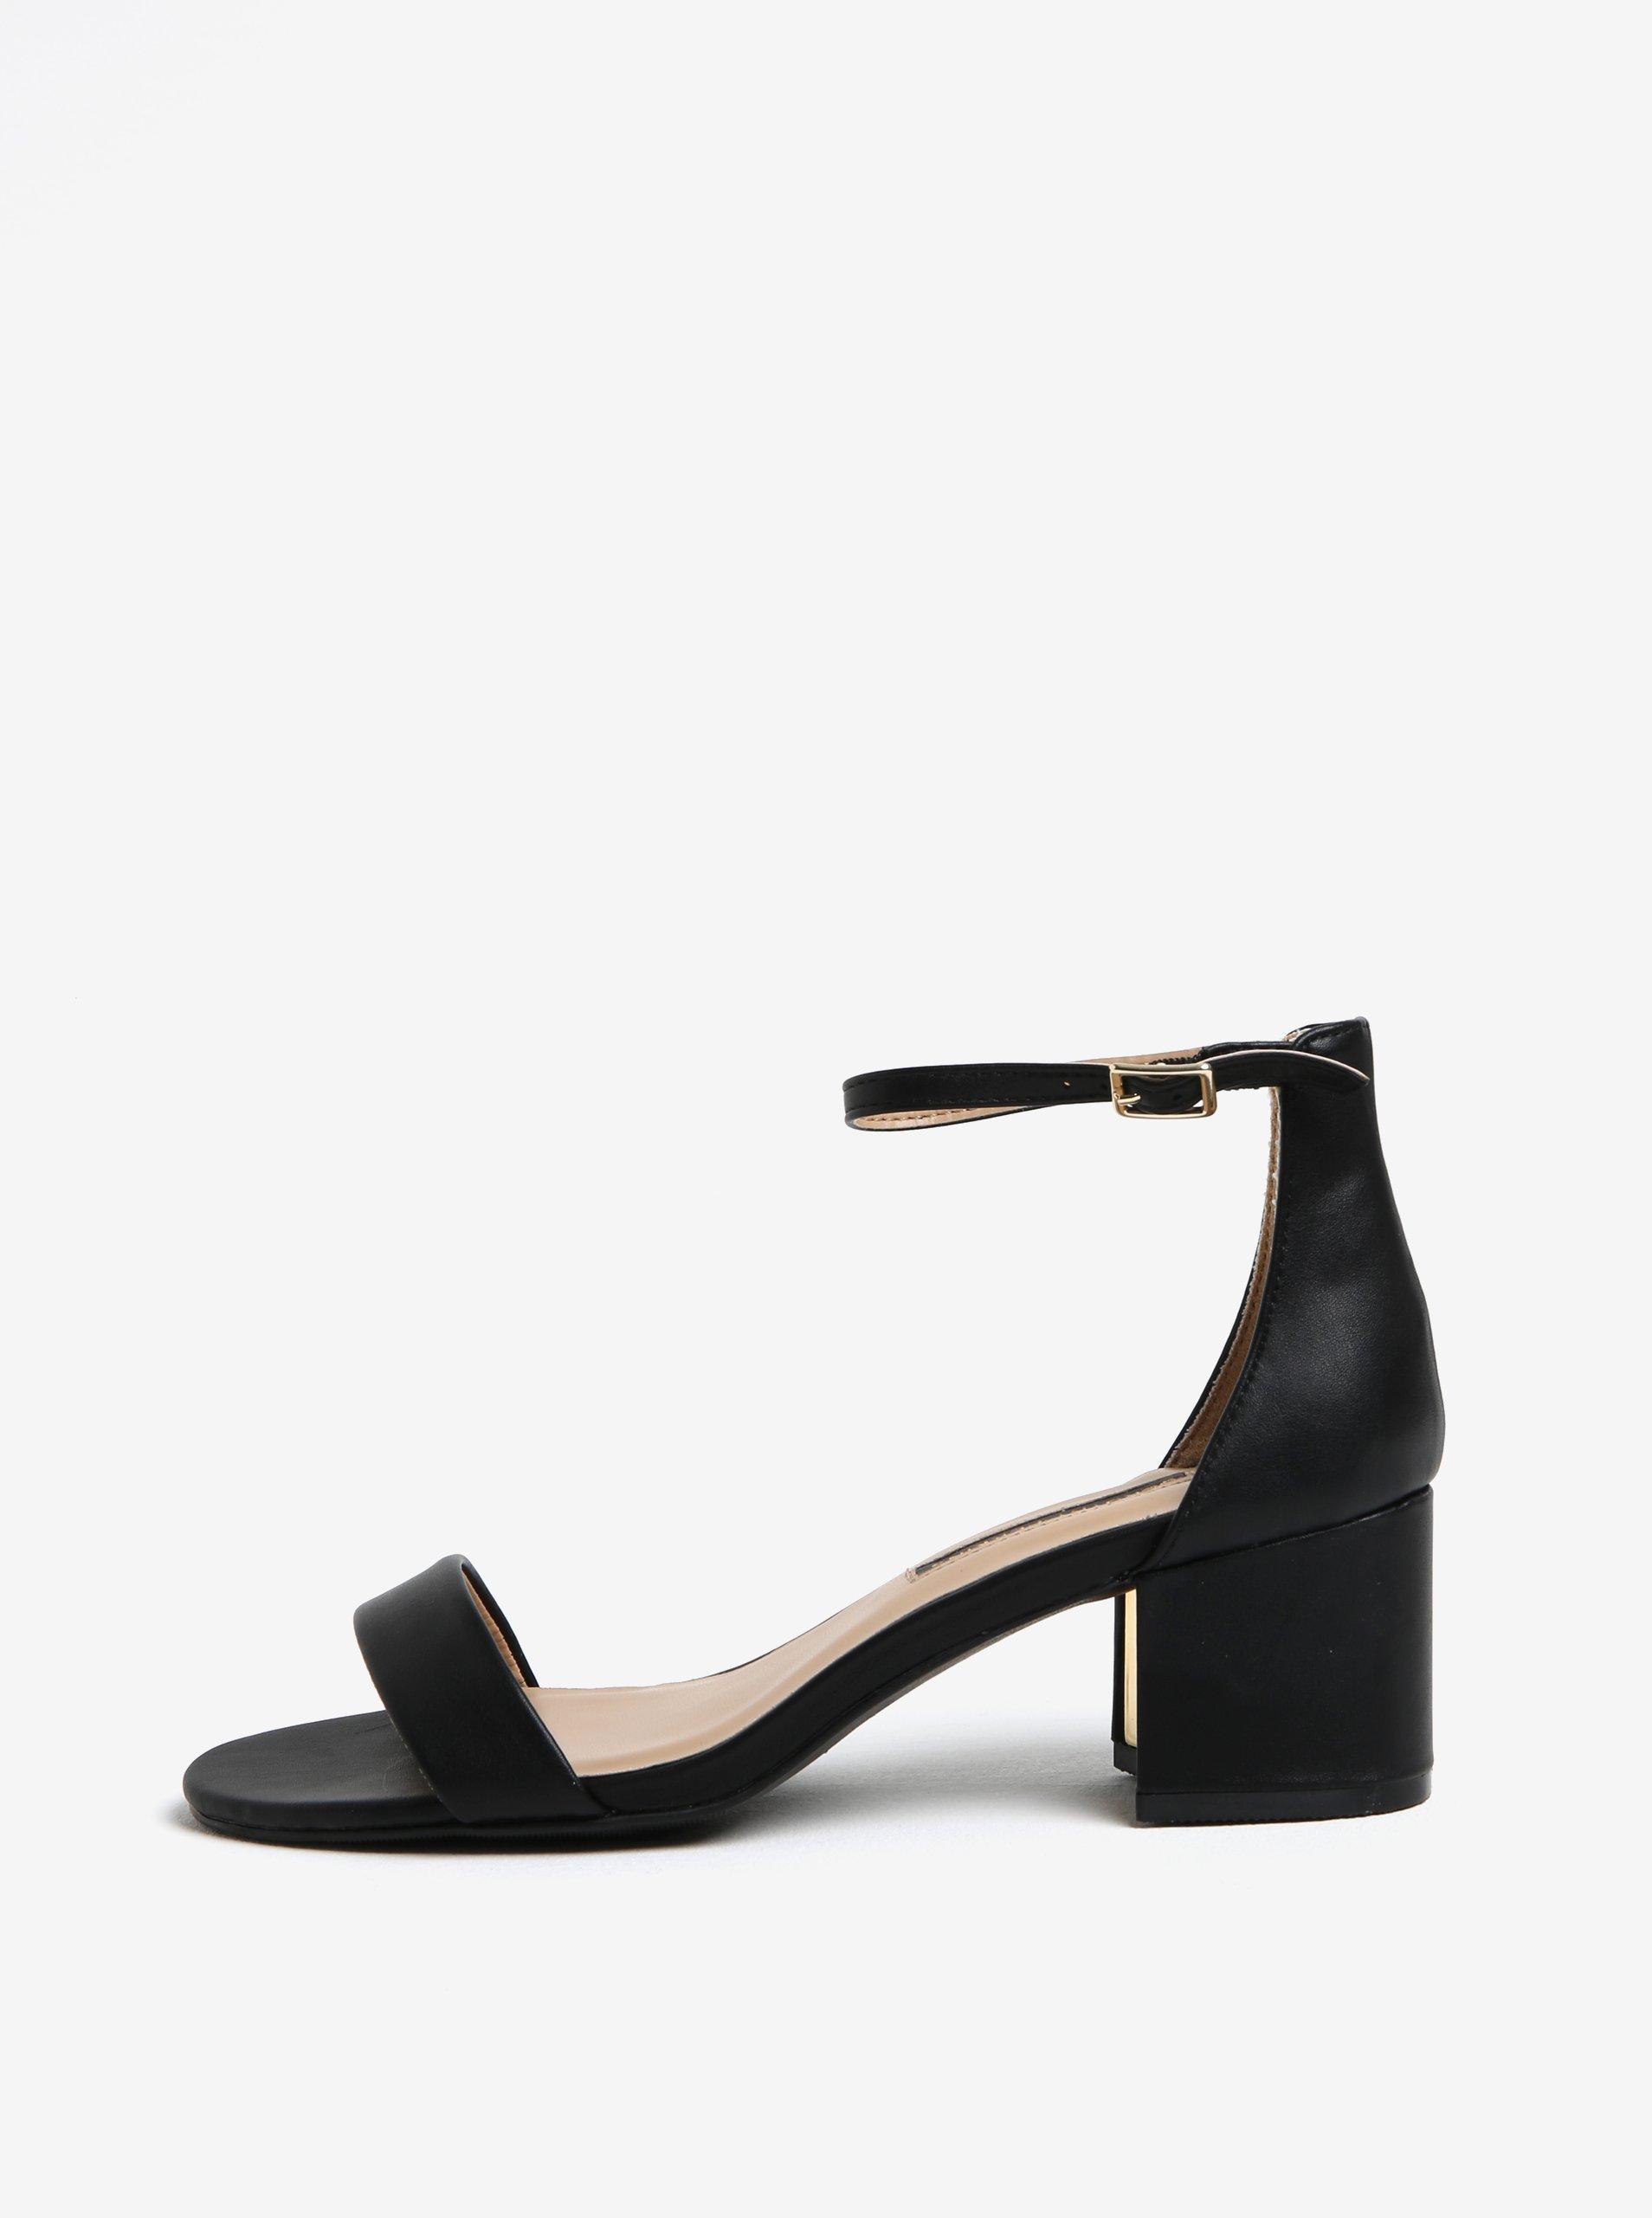 čierne sandále na podpätku Dorothy Perkins 7d88dca28f2